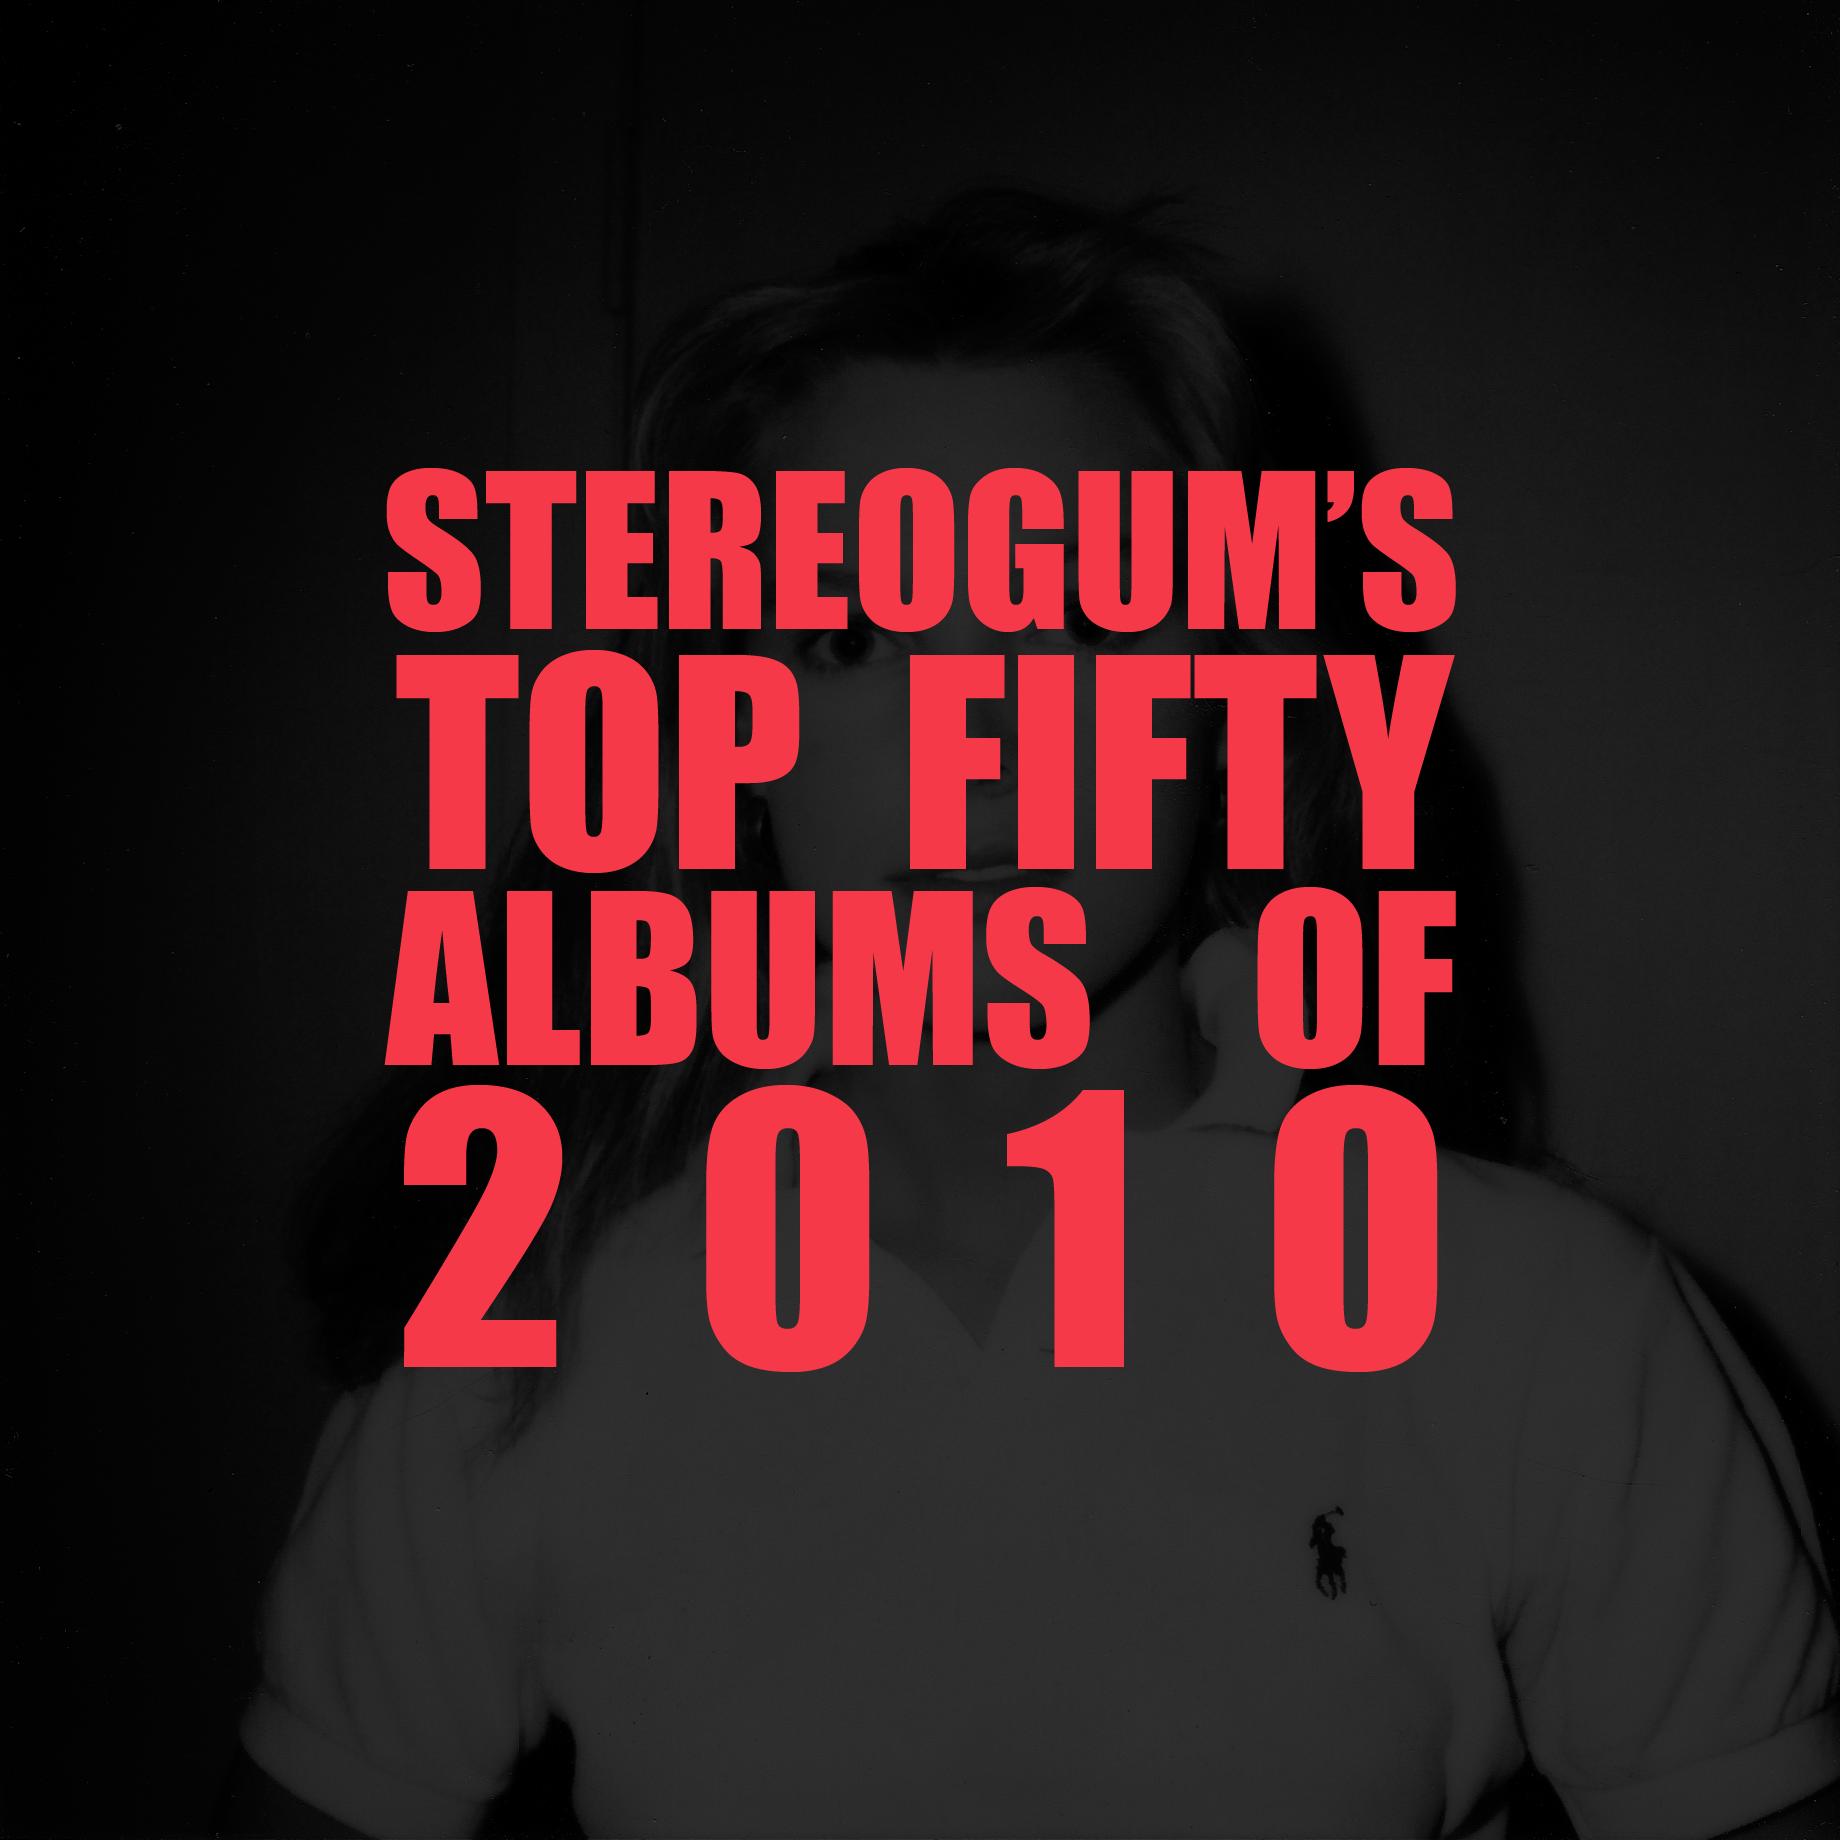 Stereogum's Top 50 Albums Of 2010 - Header